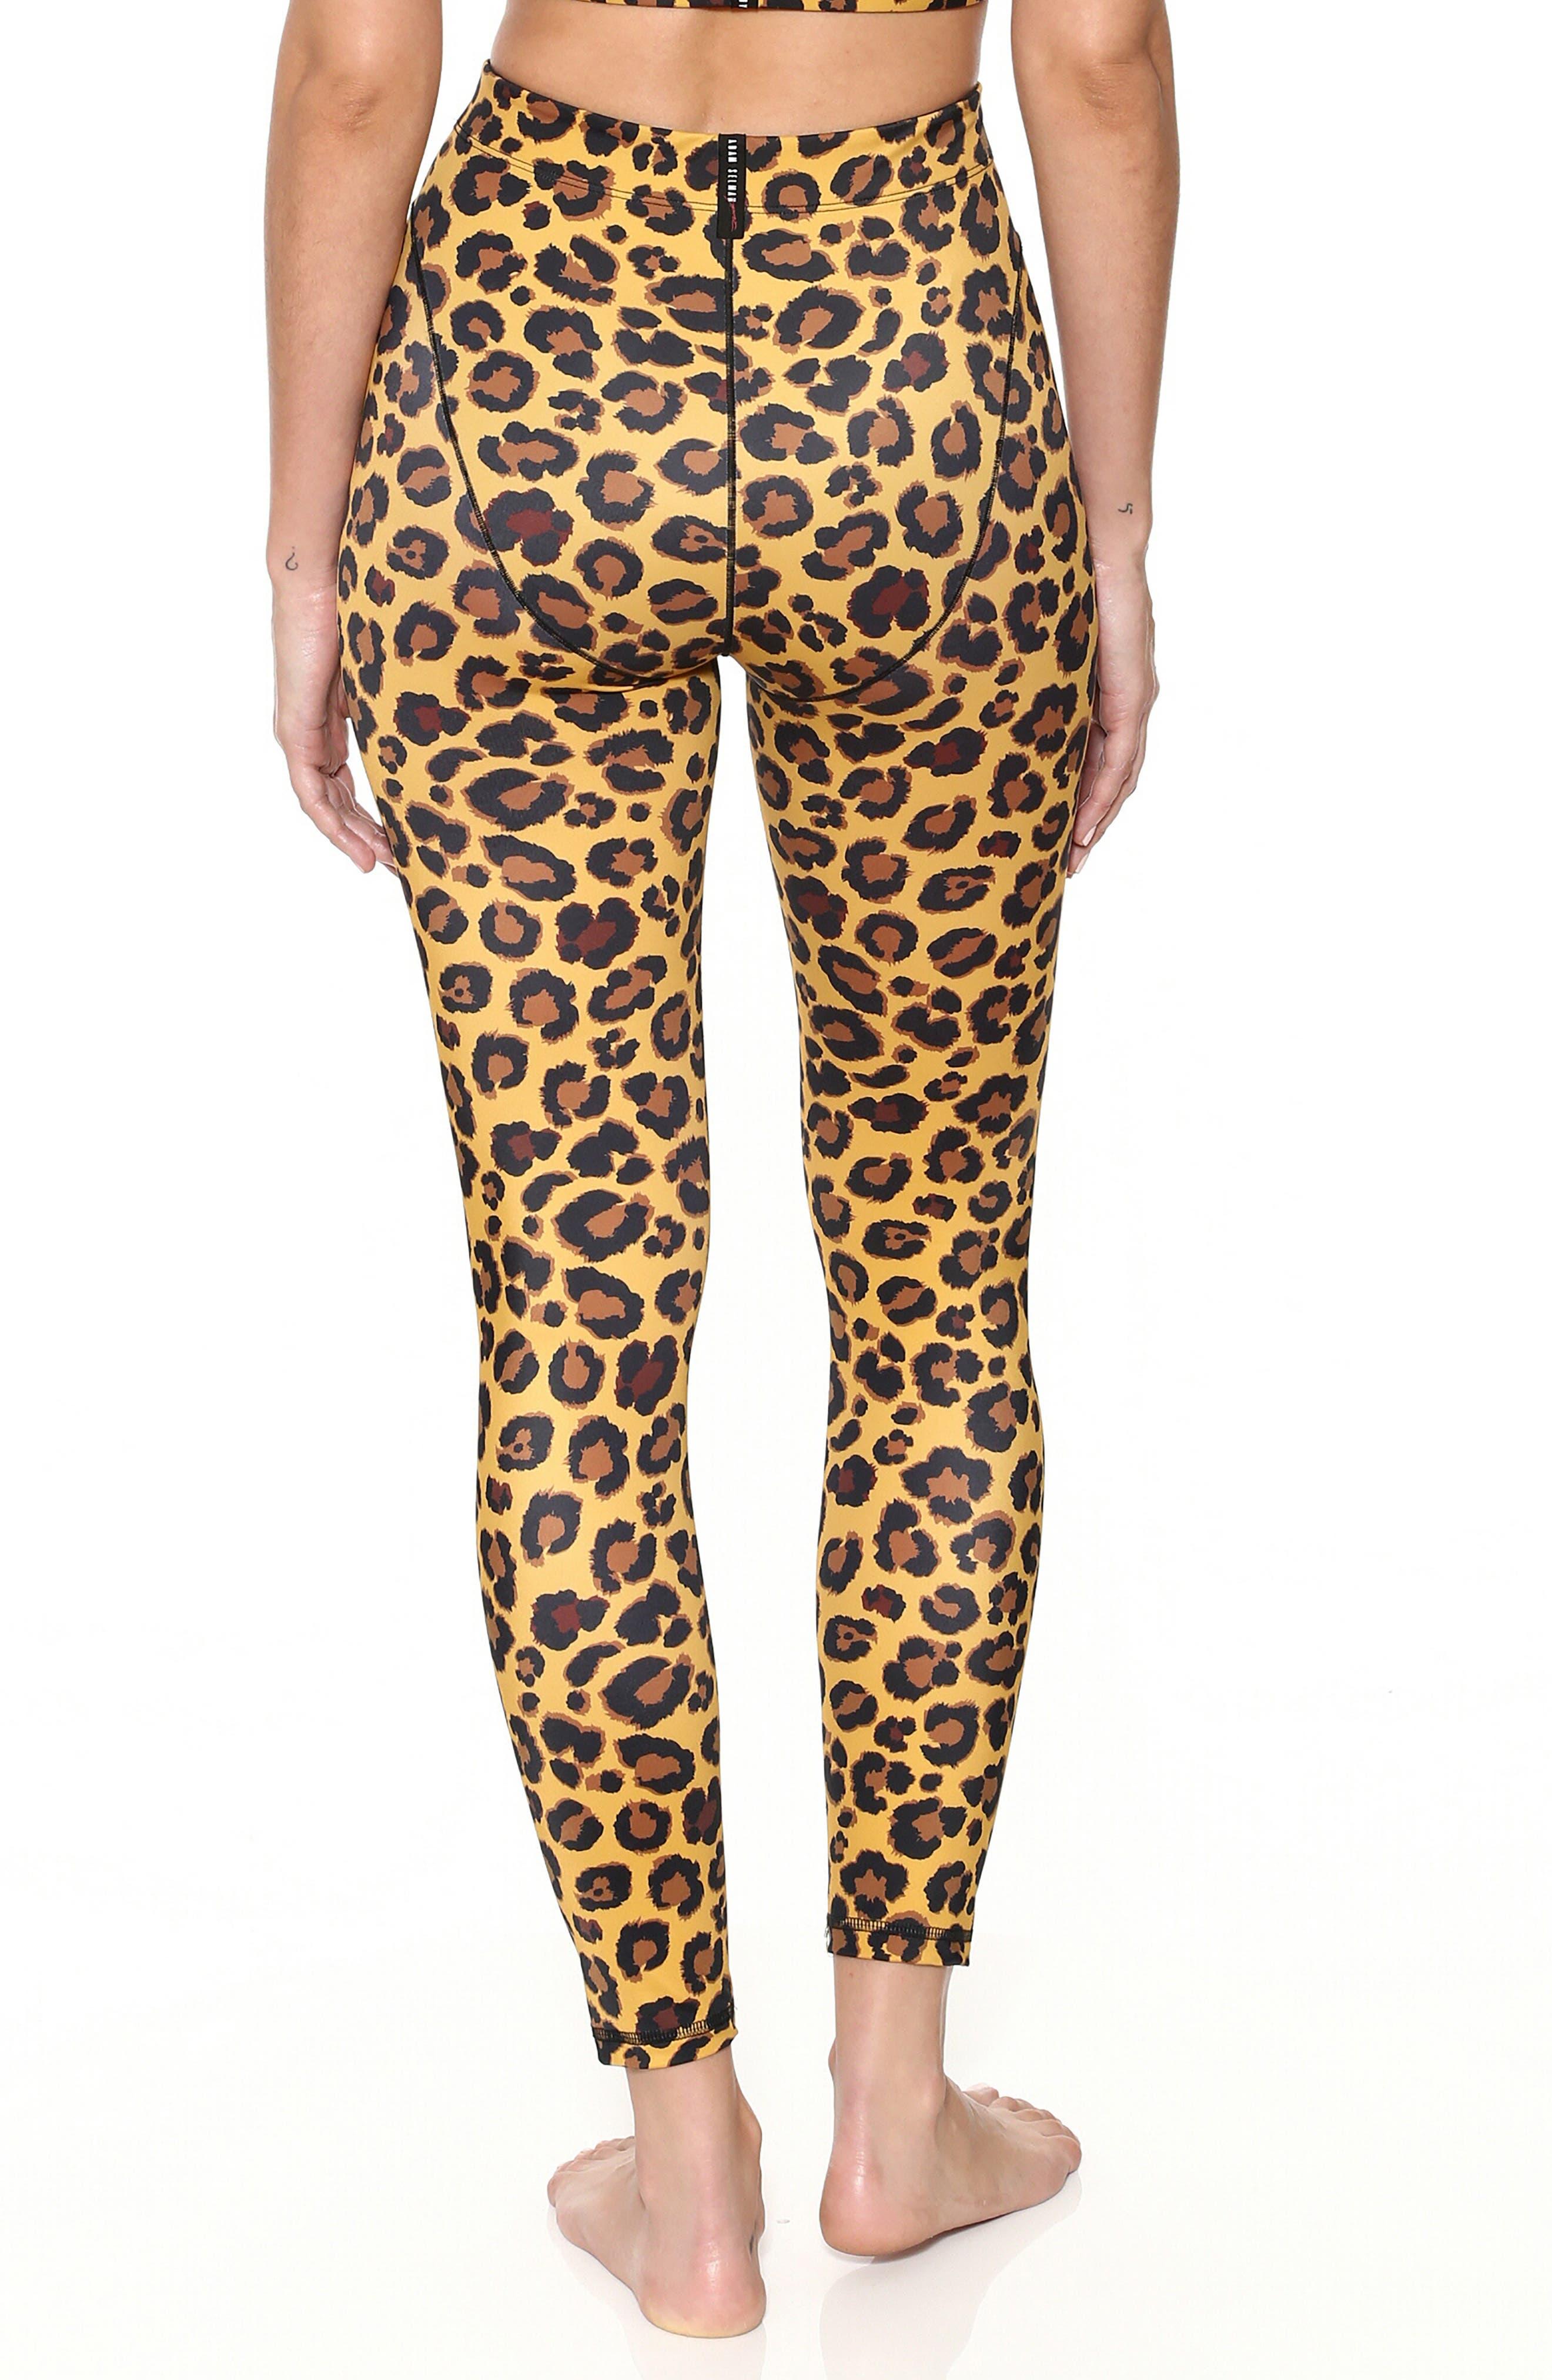 ADAM SELMAN,                             French Cut Leopard Leggings,                             Alternate thumbnail 2, color,                             HONEY LEOPARD